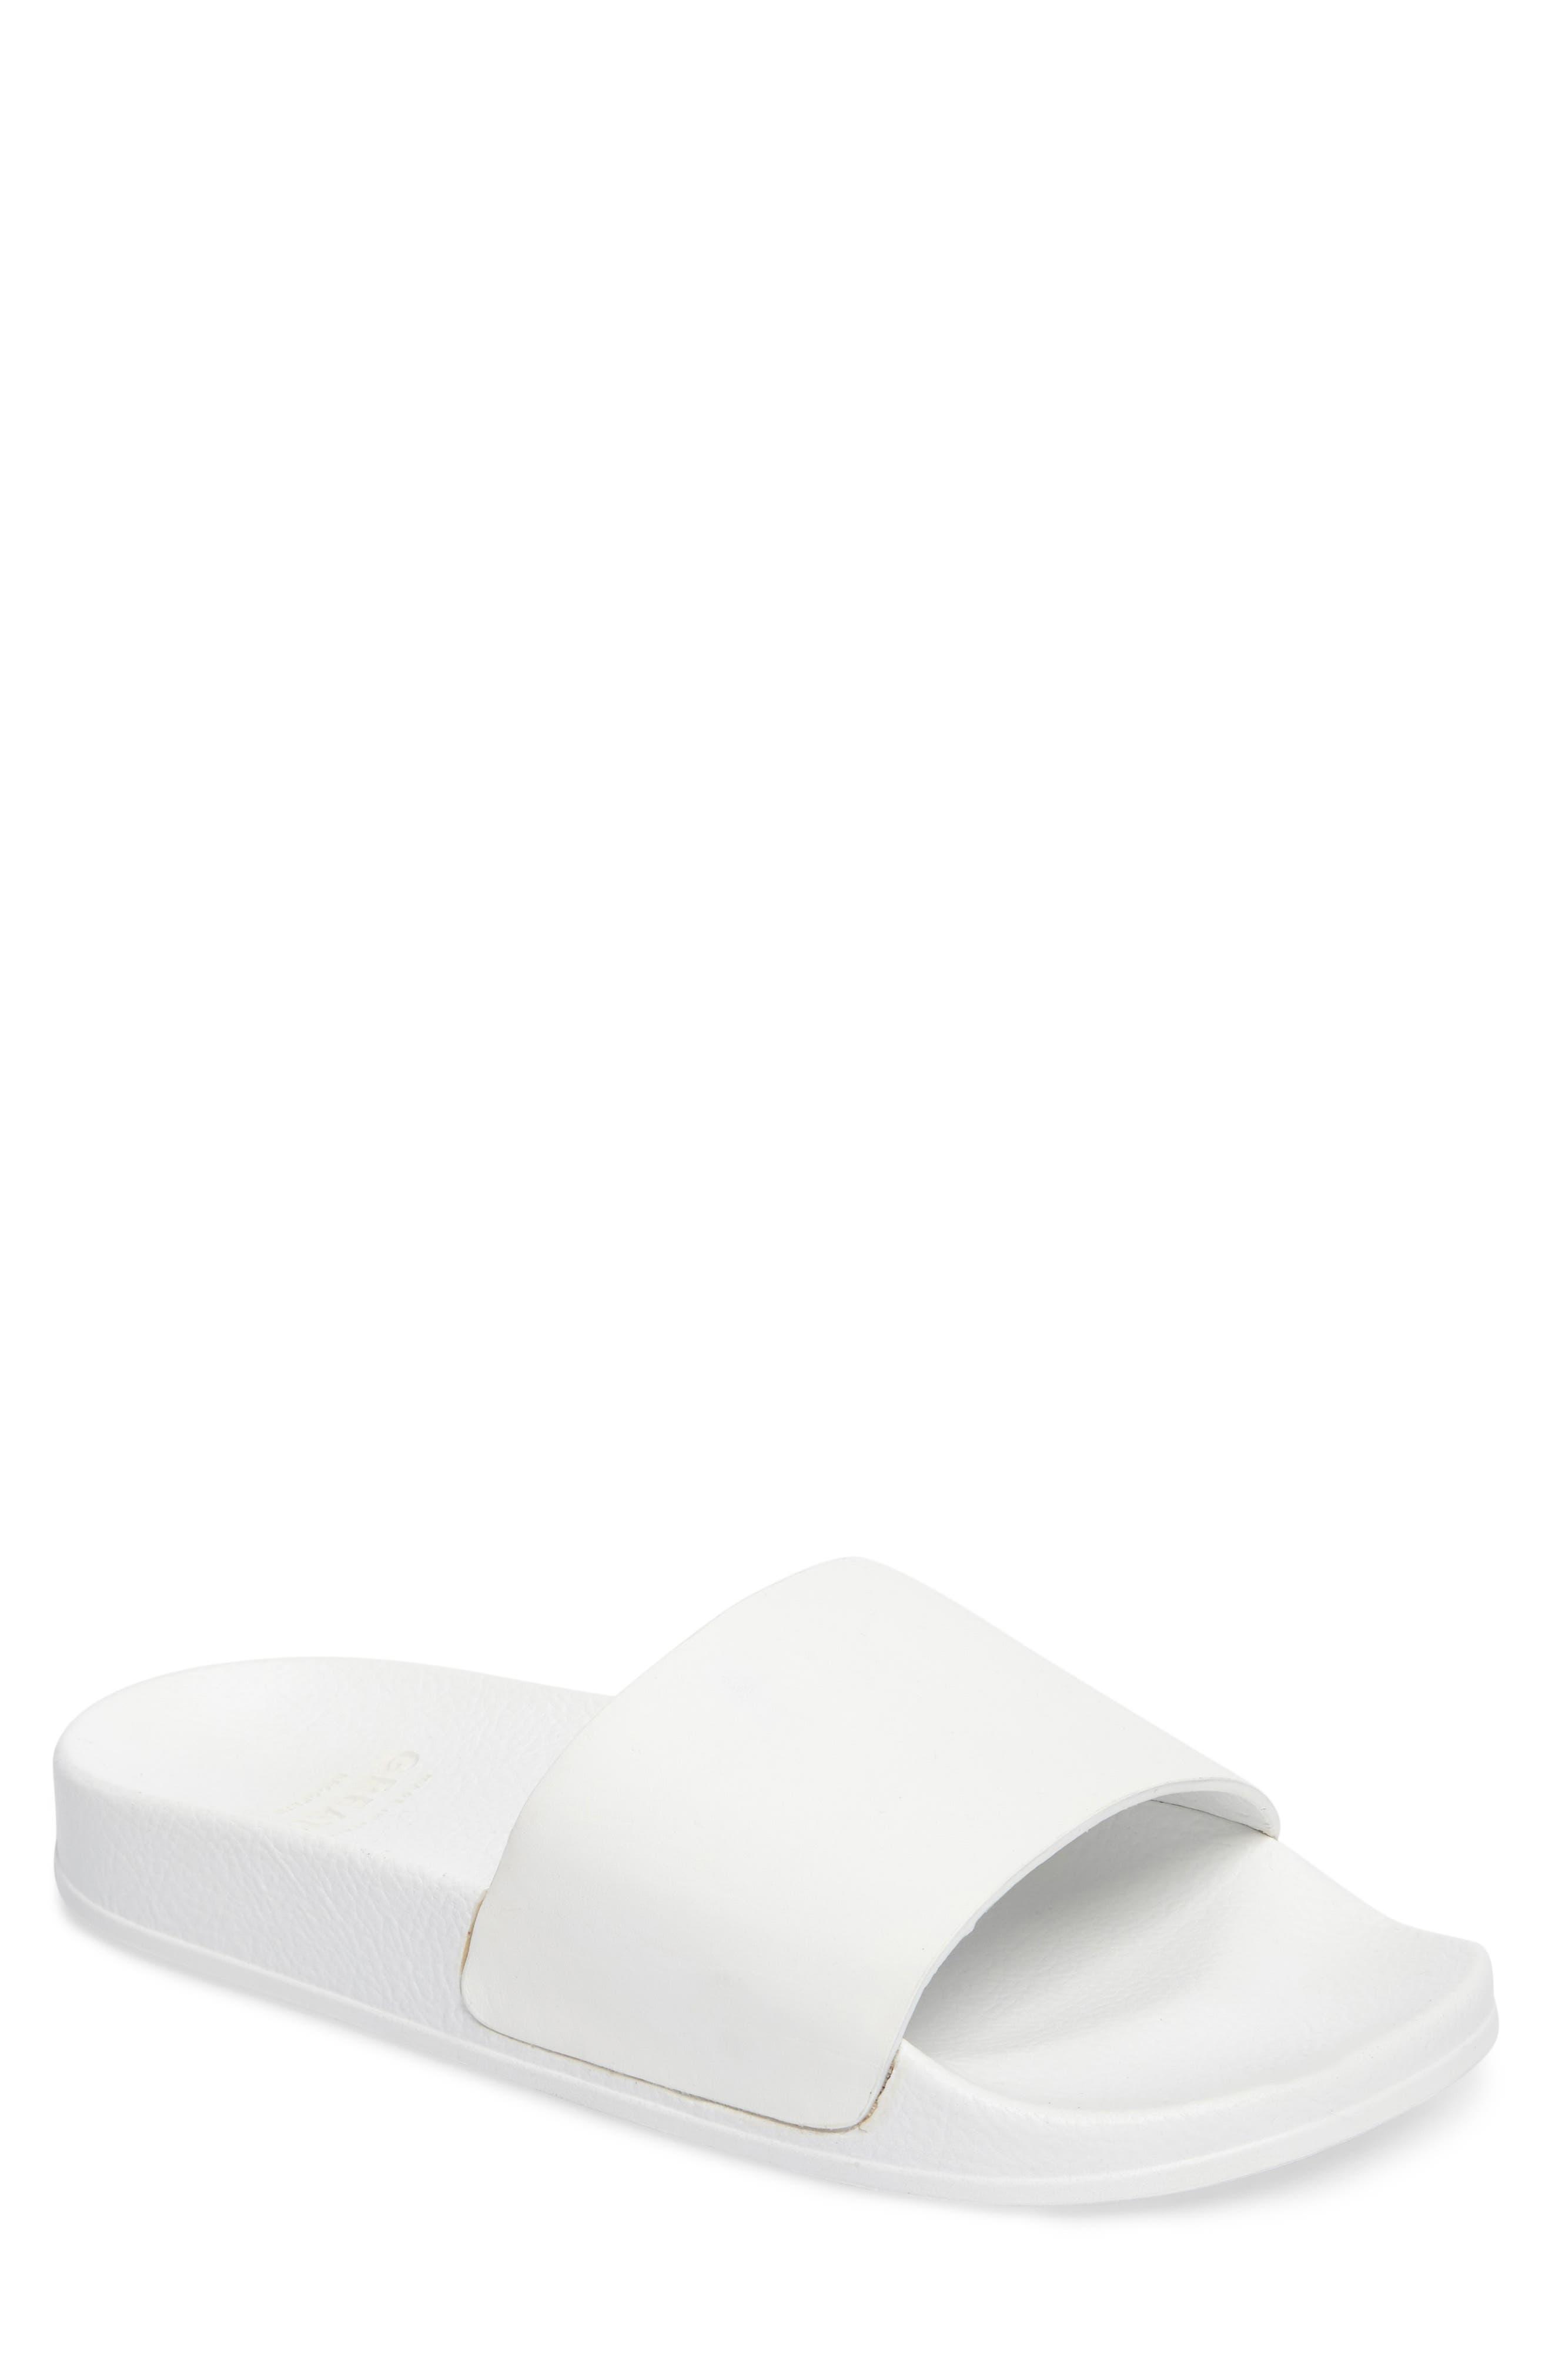 Main Image - Greats Slide Sandal (Men)